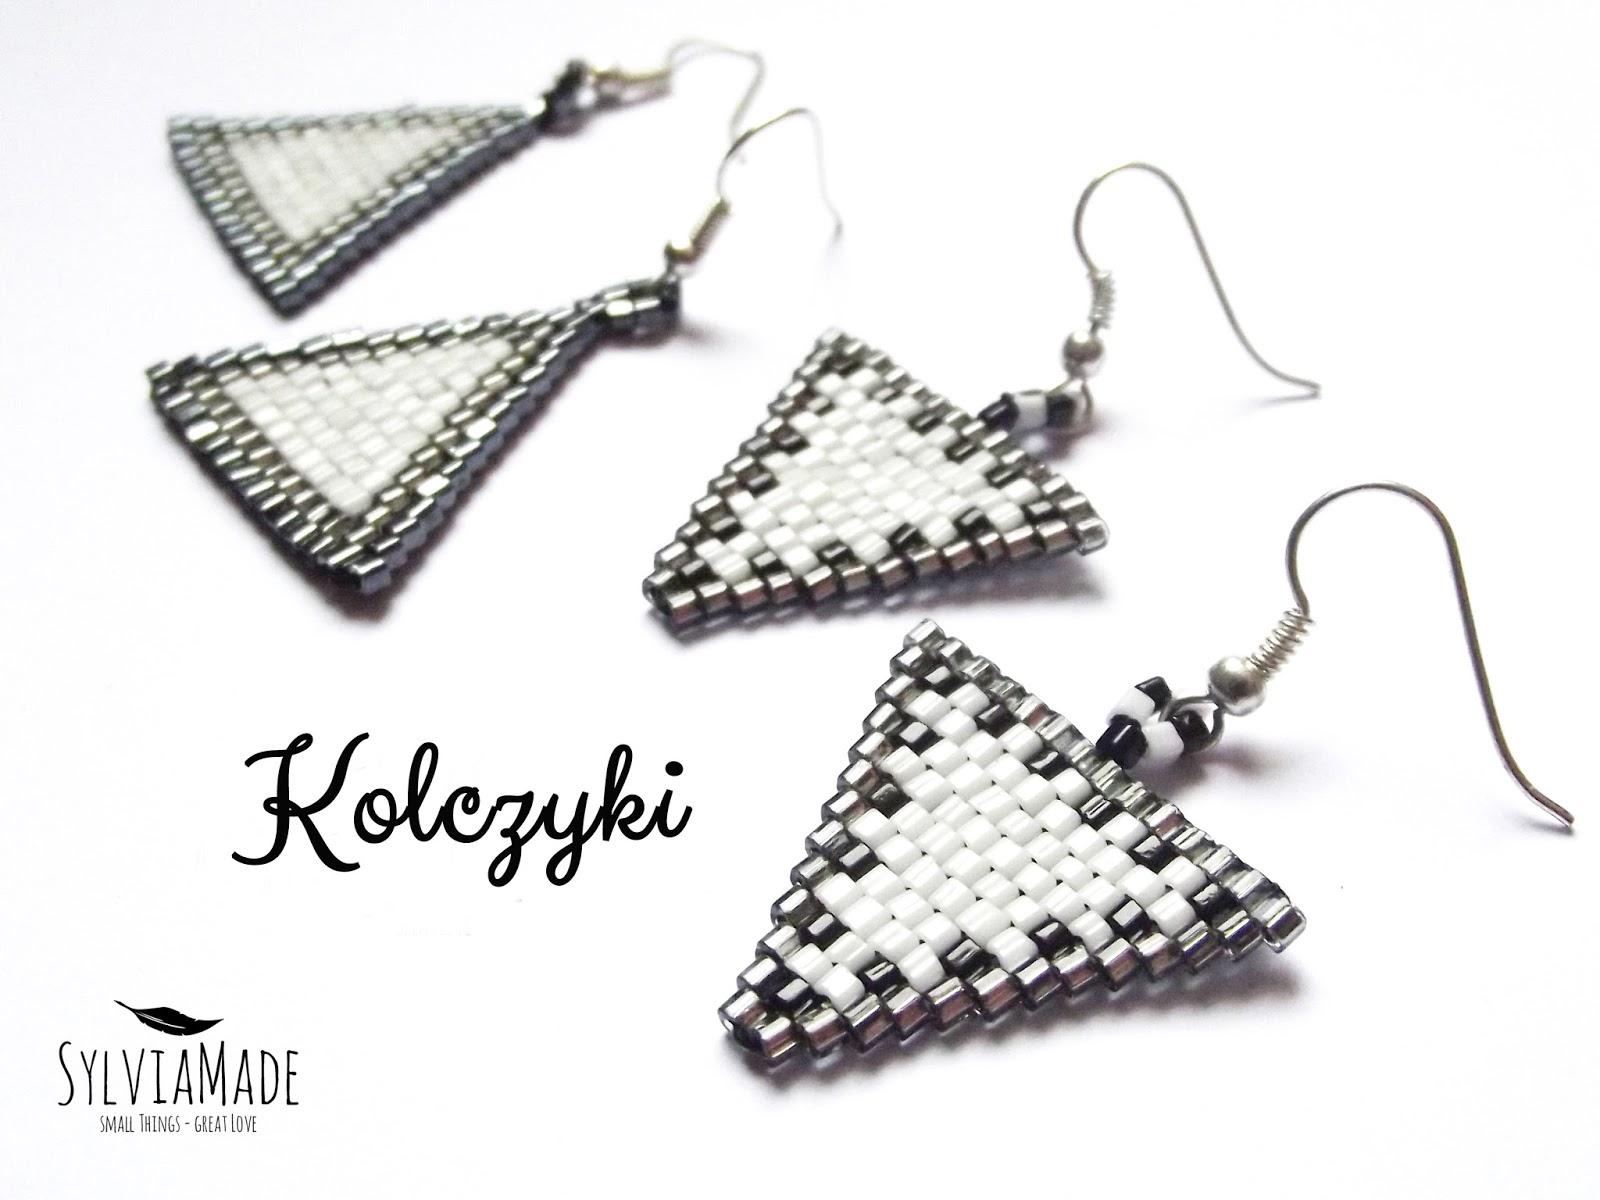 http://sylviamade.blogspot.com/p/kolczyki.html